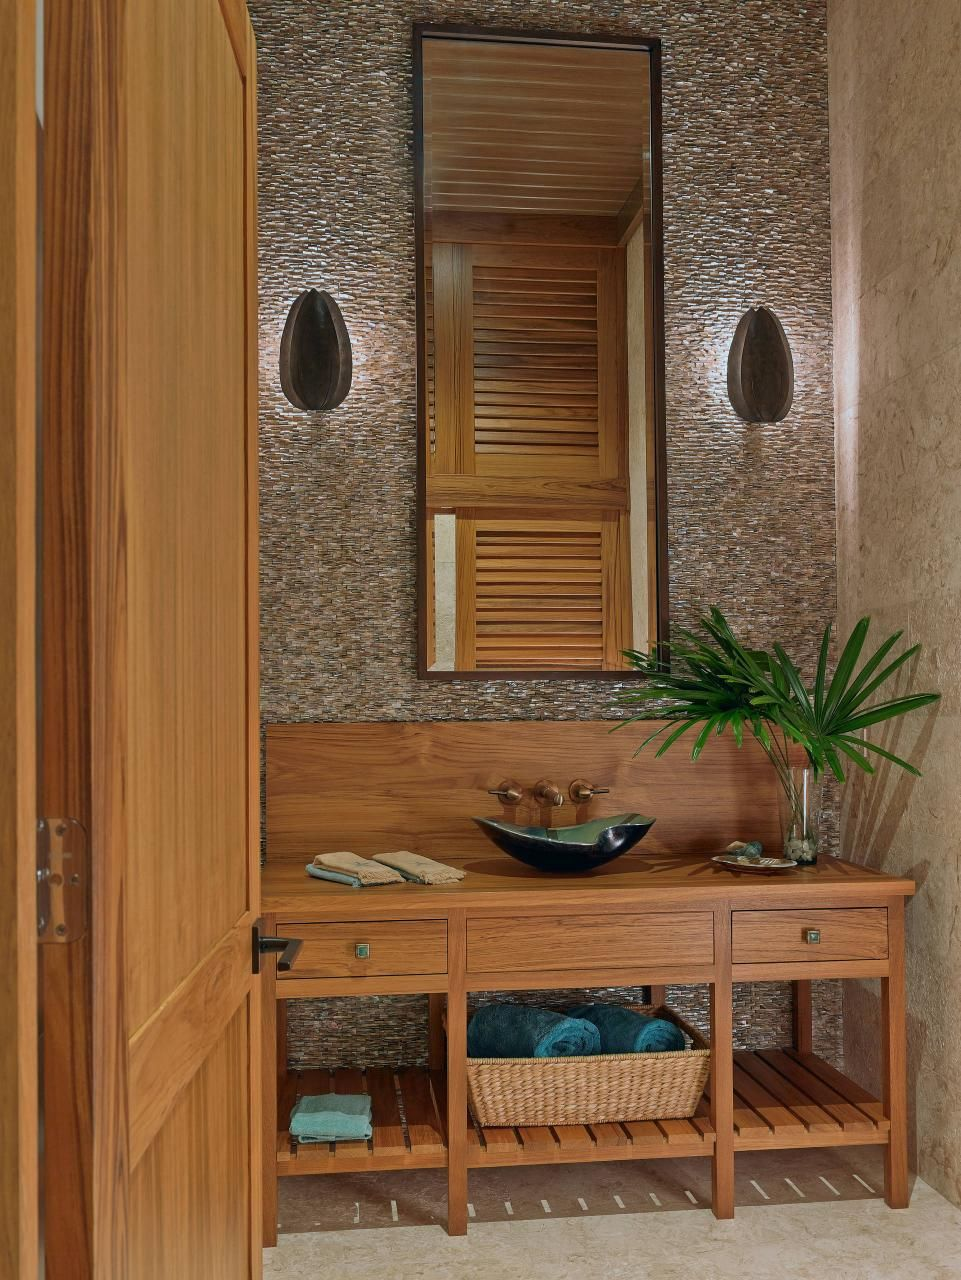 Teak Vanity, Slatted Wood Bottom Shelf, Stained Wood Door